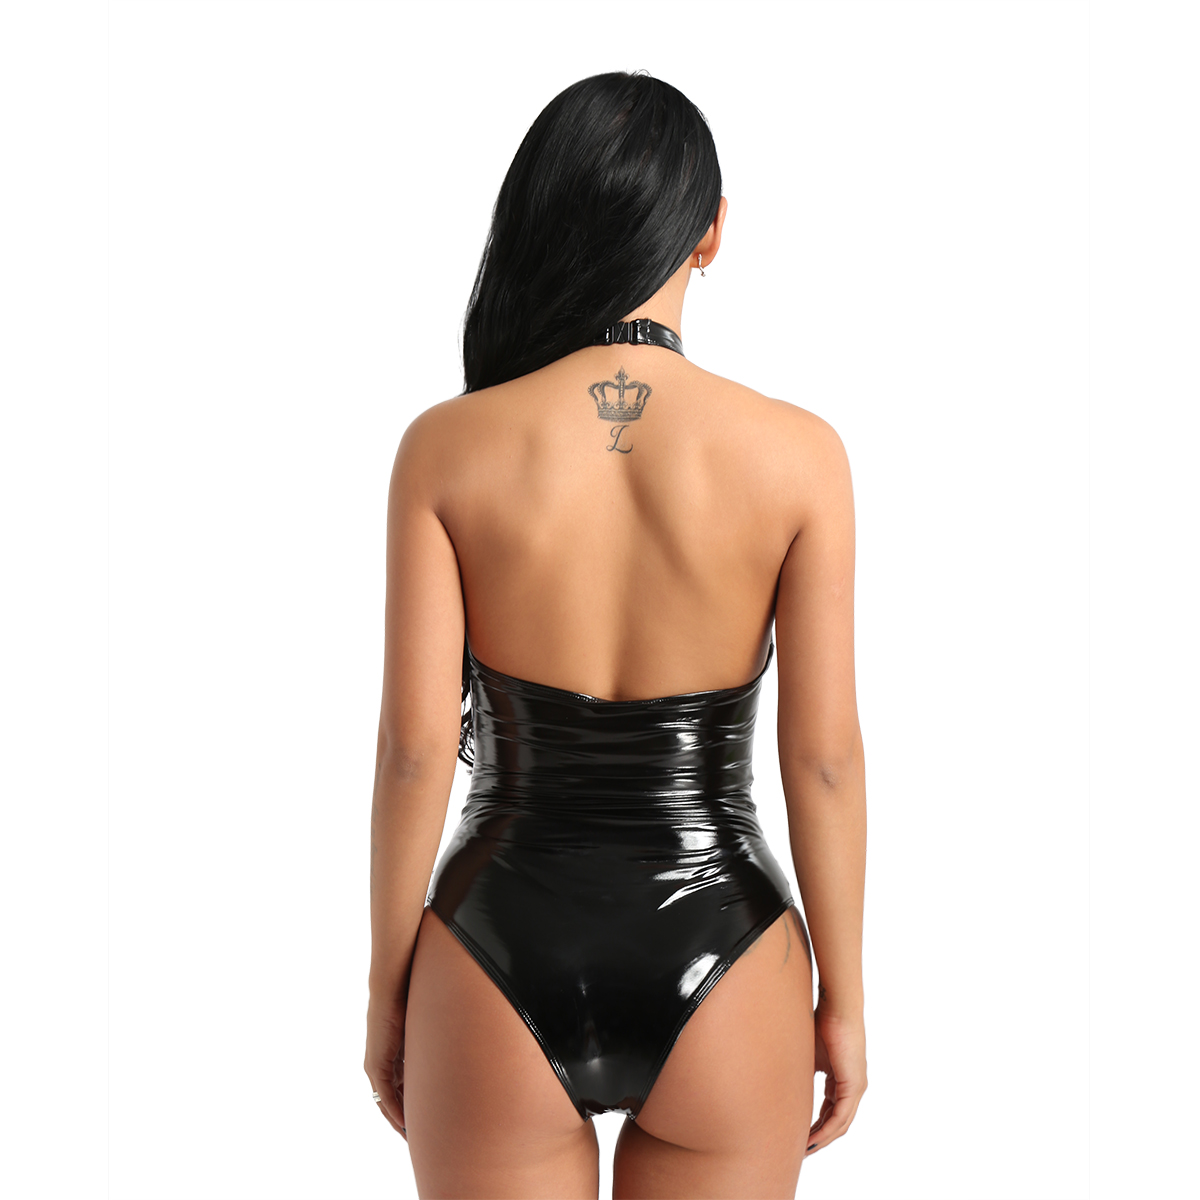 TiaoBug Women One-piece Wetlook Faux Leather Mesh Patchwork Sexy Bodysuit Lady Halter High Cut Nightclub Party Teddies Jumpsuit